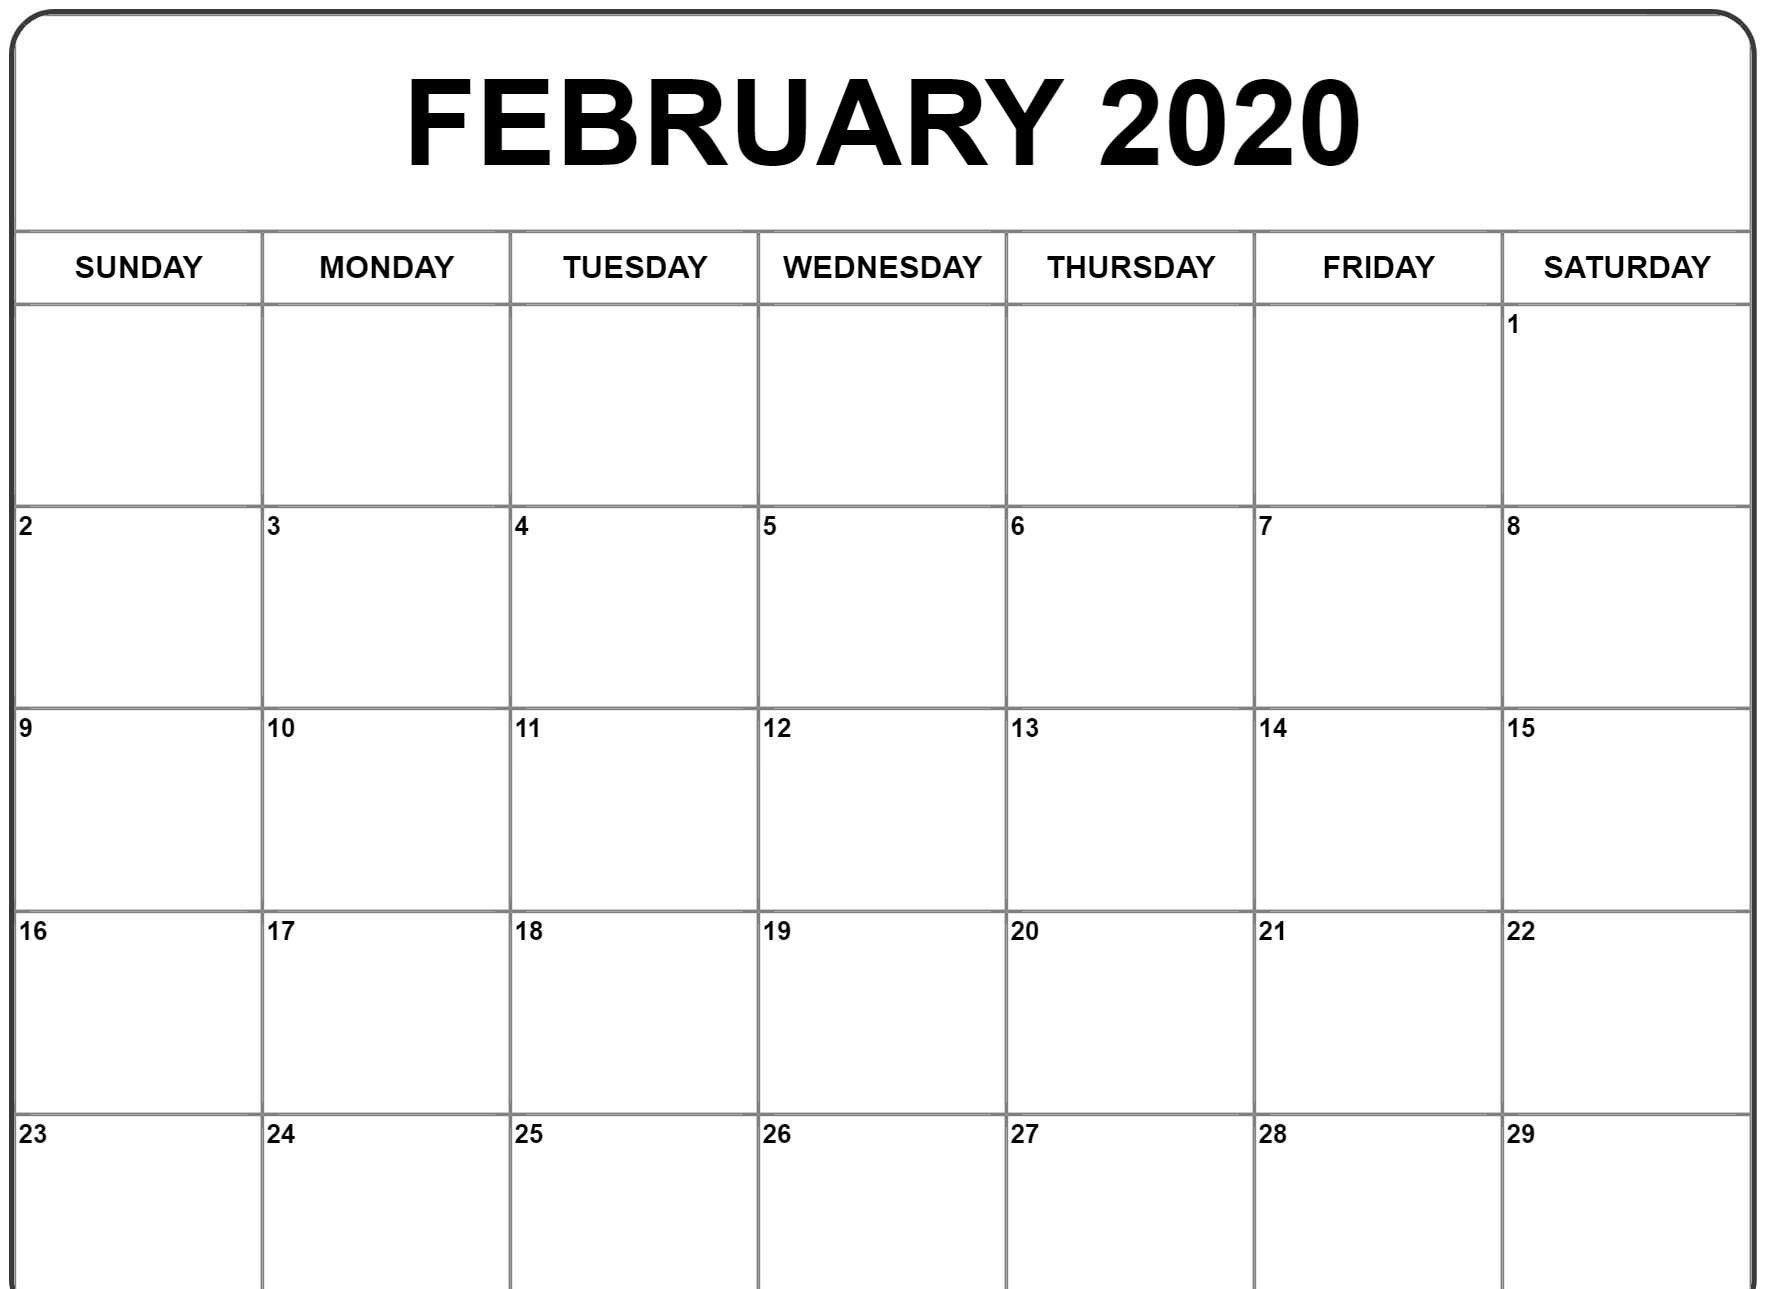 Free Printable February 2020 Blank Calendar Templates  Printable February 2020 Calendar Page